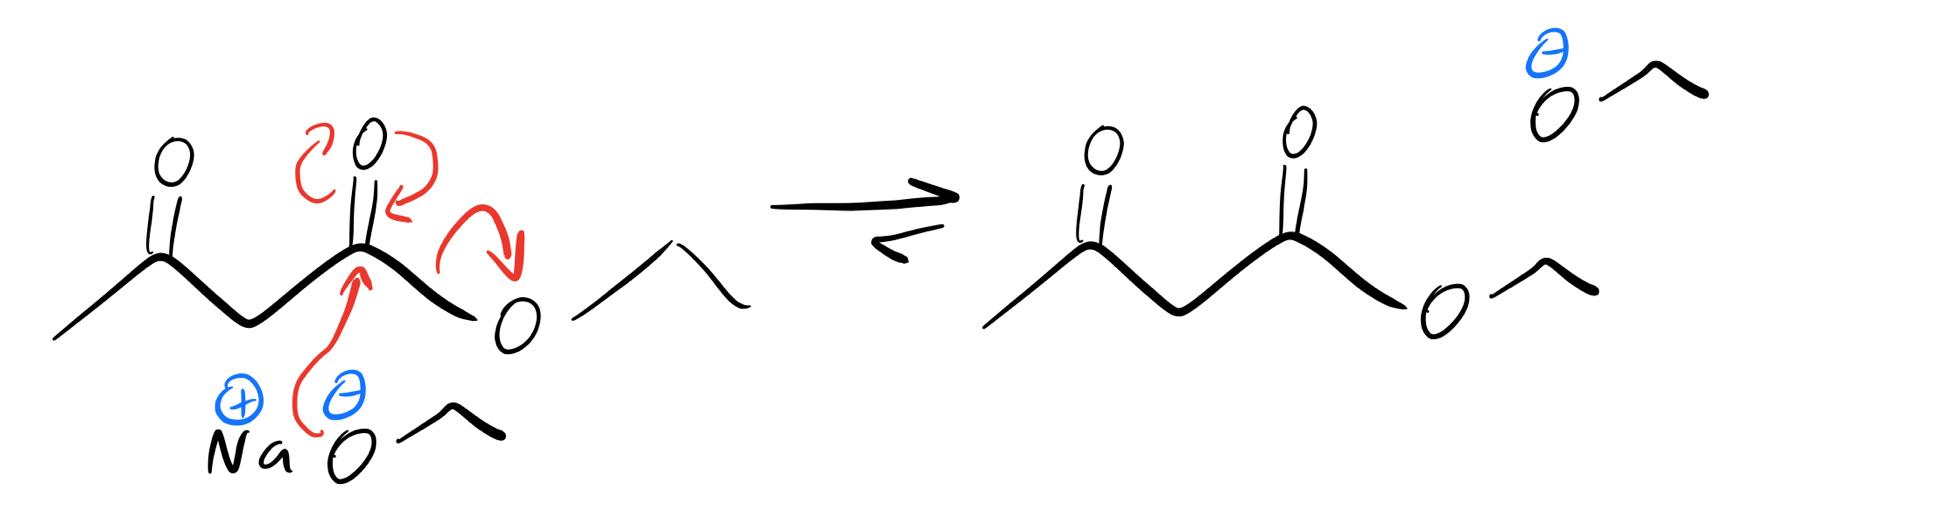 Fischer-esterification-with-sodium-ethoxide